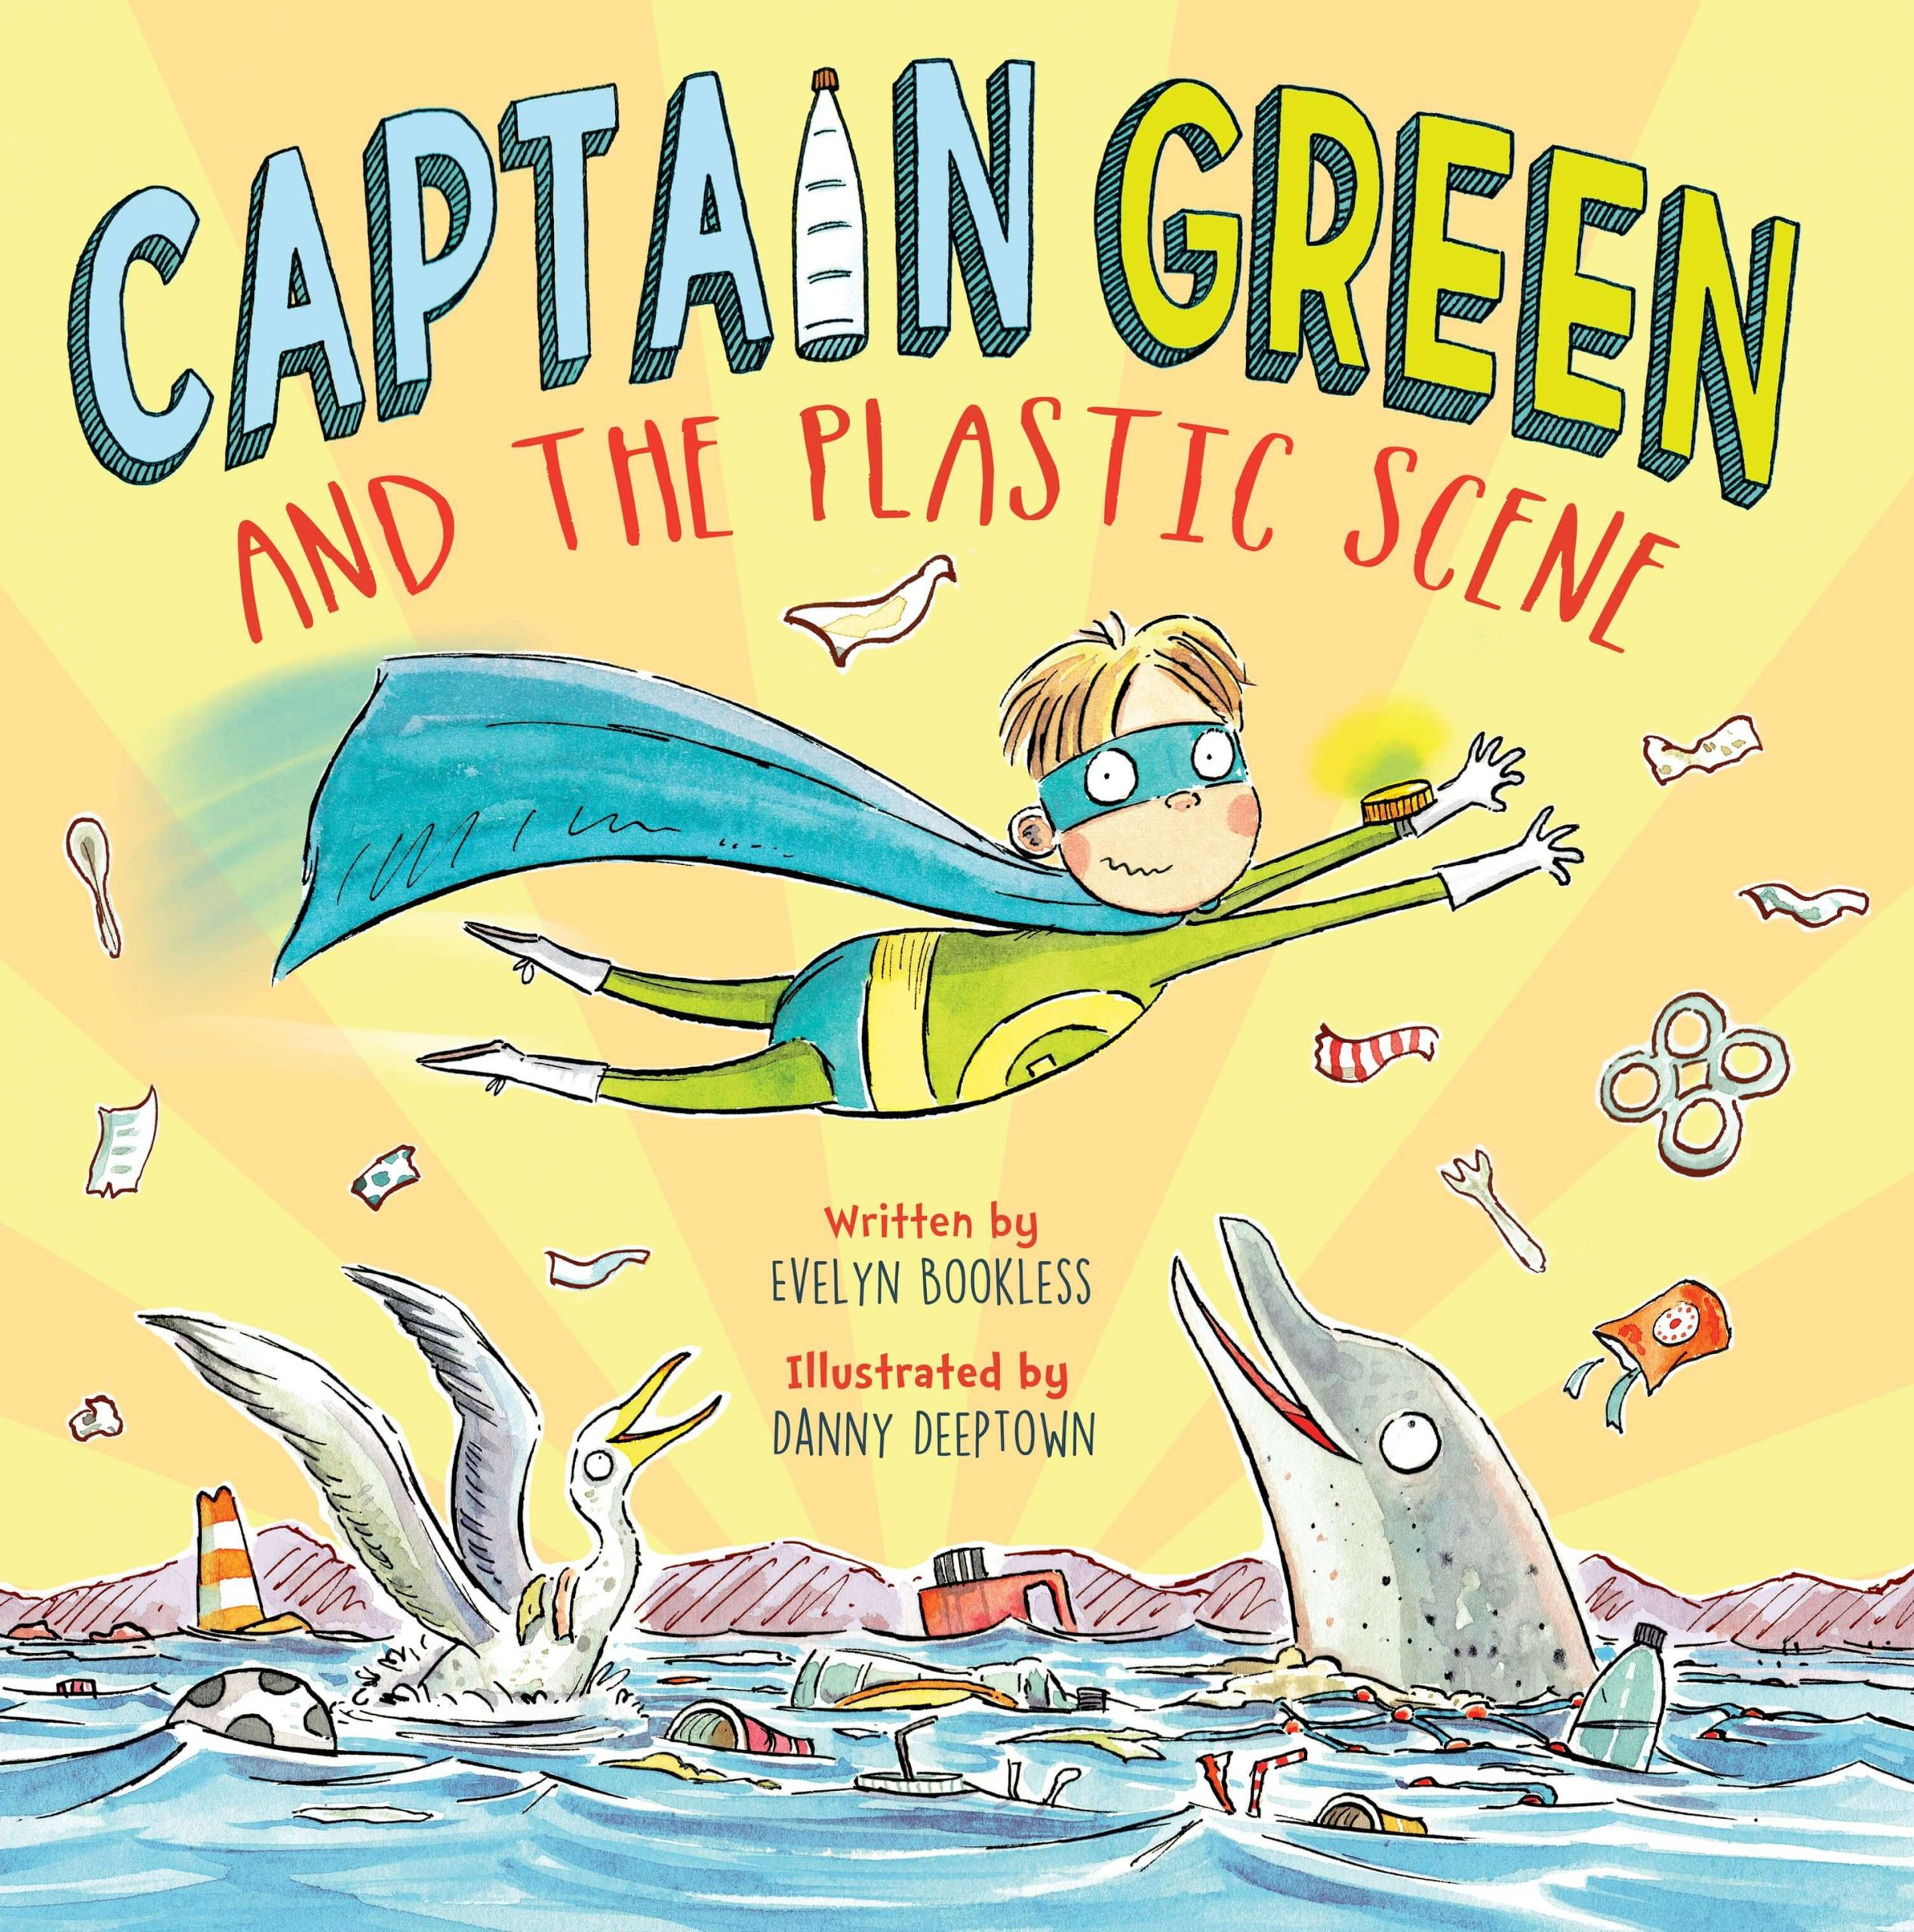 Book: Captain Green and the plastic scene